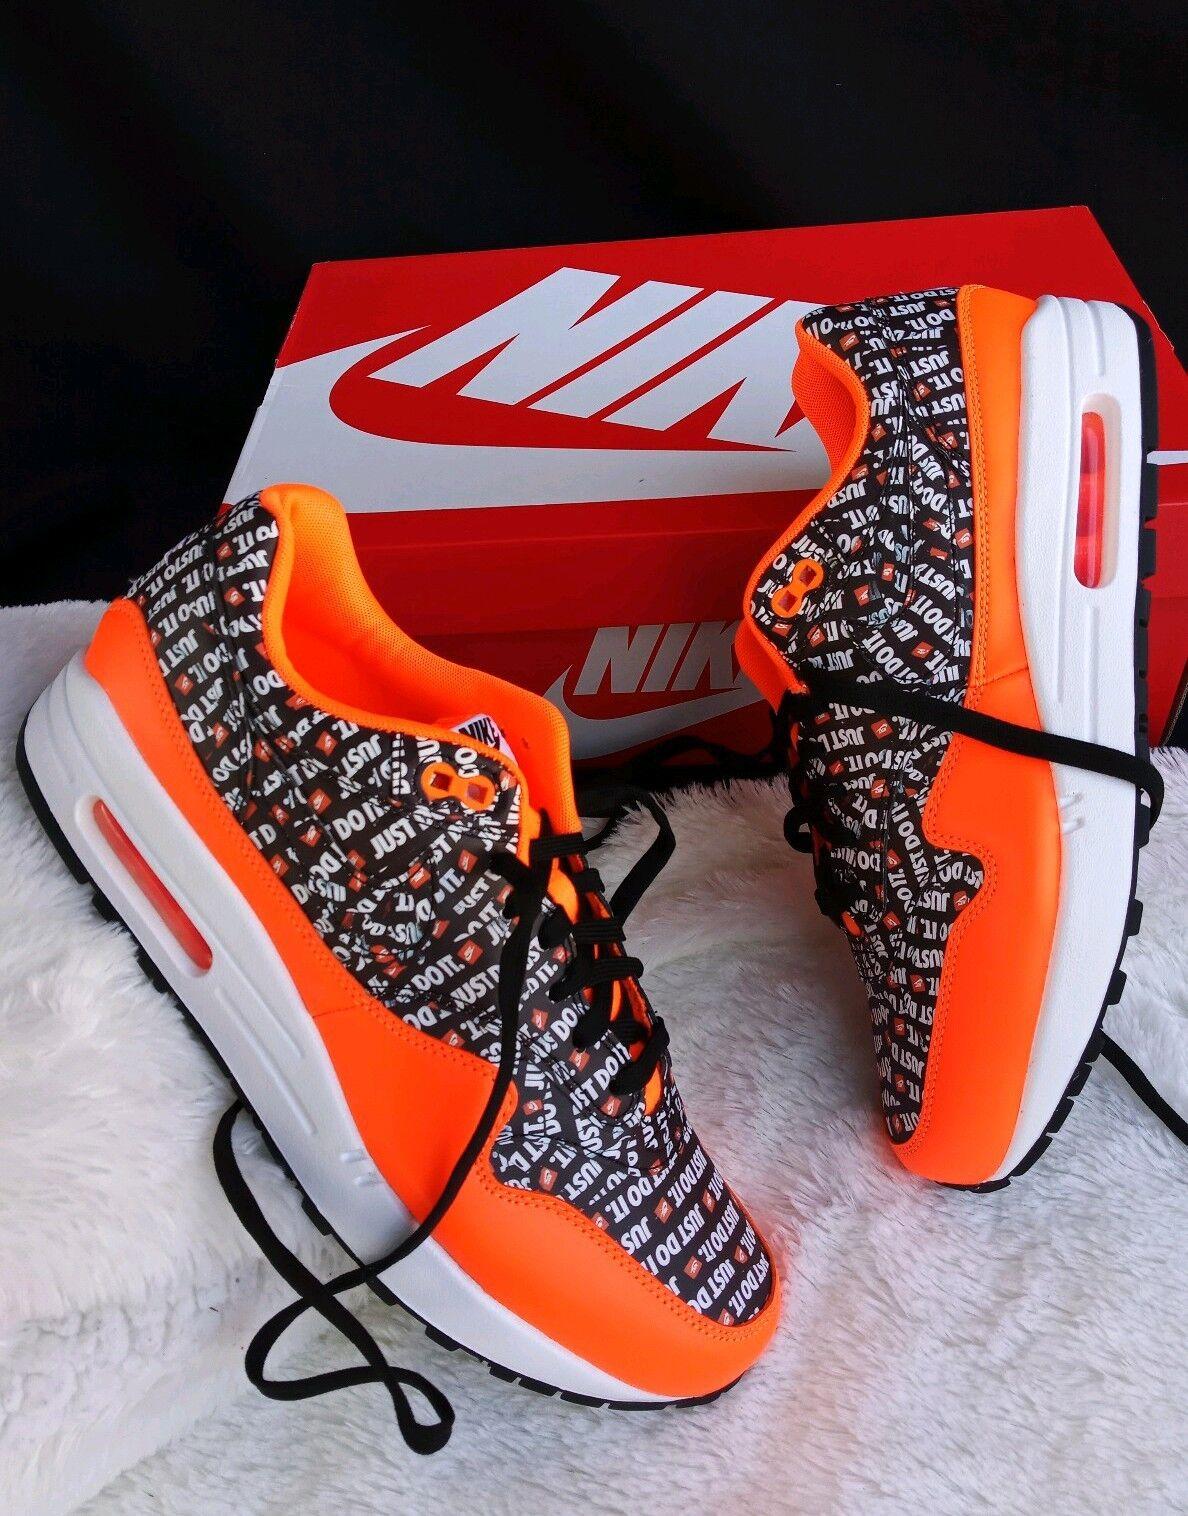 8.5 Men Nike Air Max 1 Premium Just Do It Black orange 875844-008 ALL PRINT LOGO